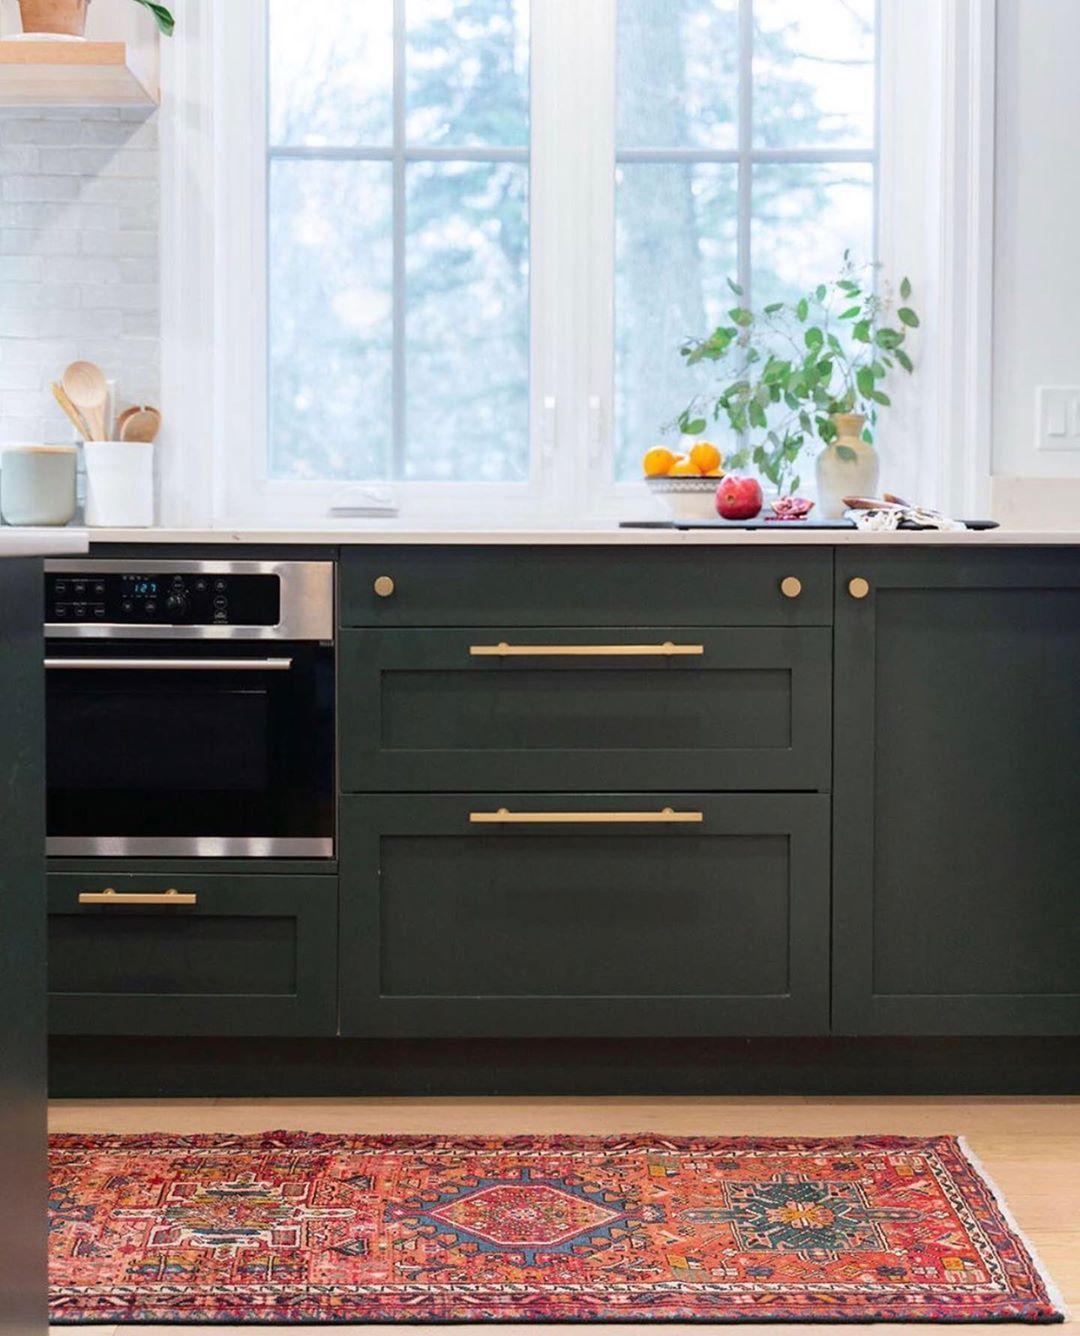 Doors For Ikea Cabinets Kitchen Bathroom Closet Media Semihandmade In 2020 Blue Shaker Kitchen Green Kitchen Cabinets Shaker Kitchen Cabinets